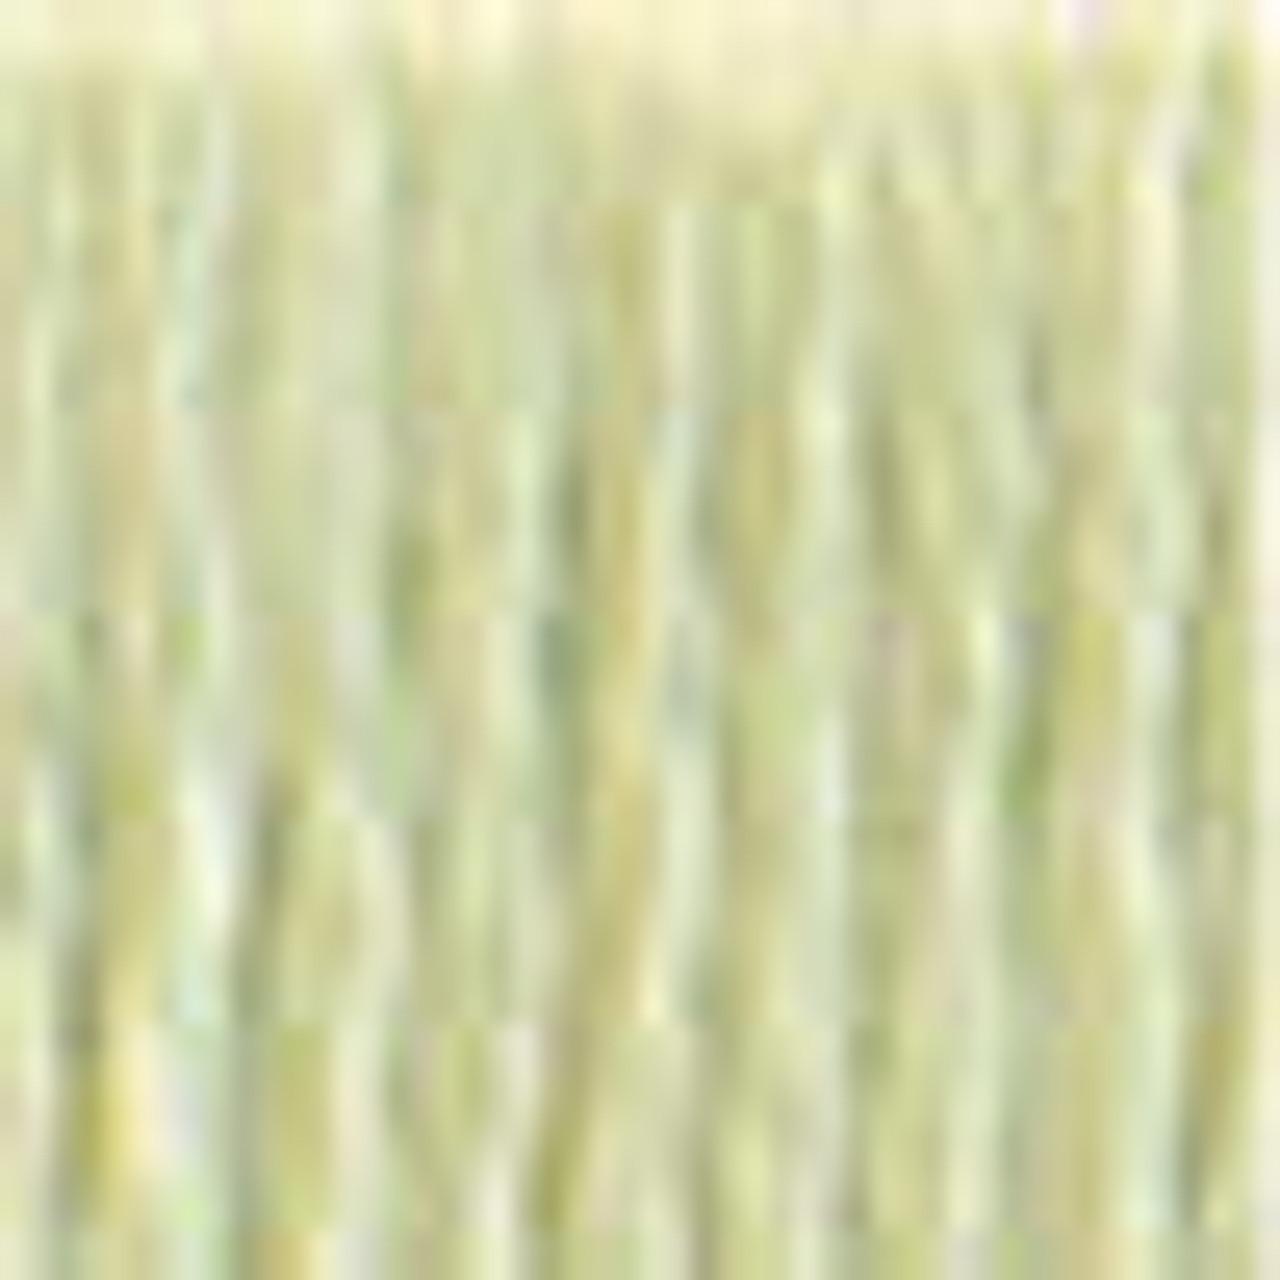 DMC # 772 Very Light Yellow Green Floss / Thread